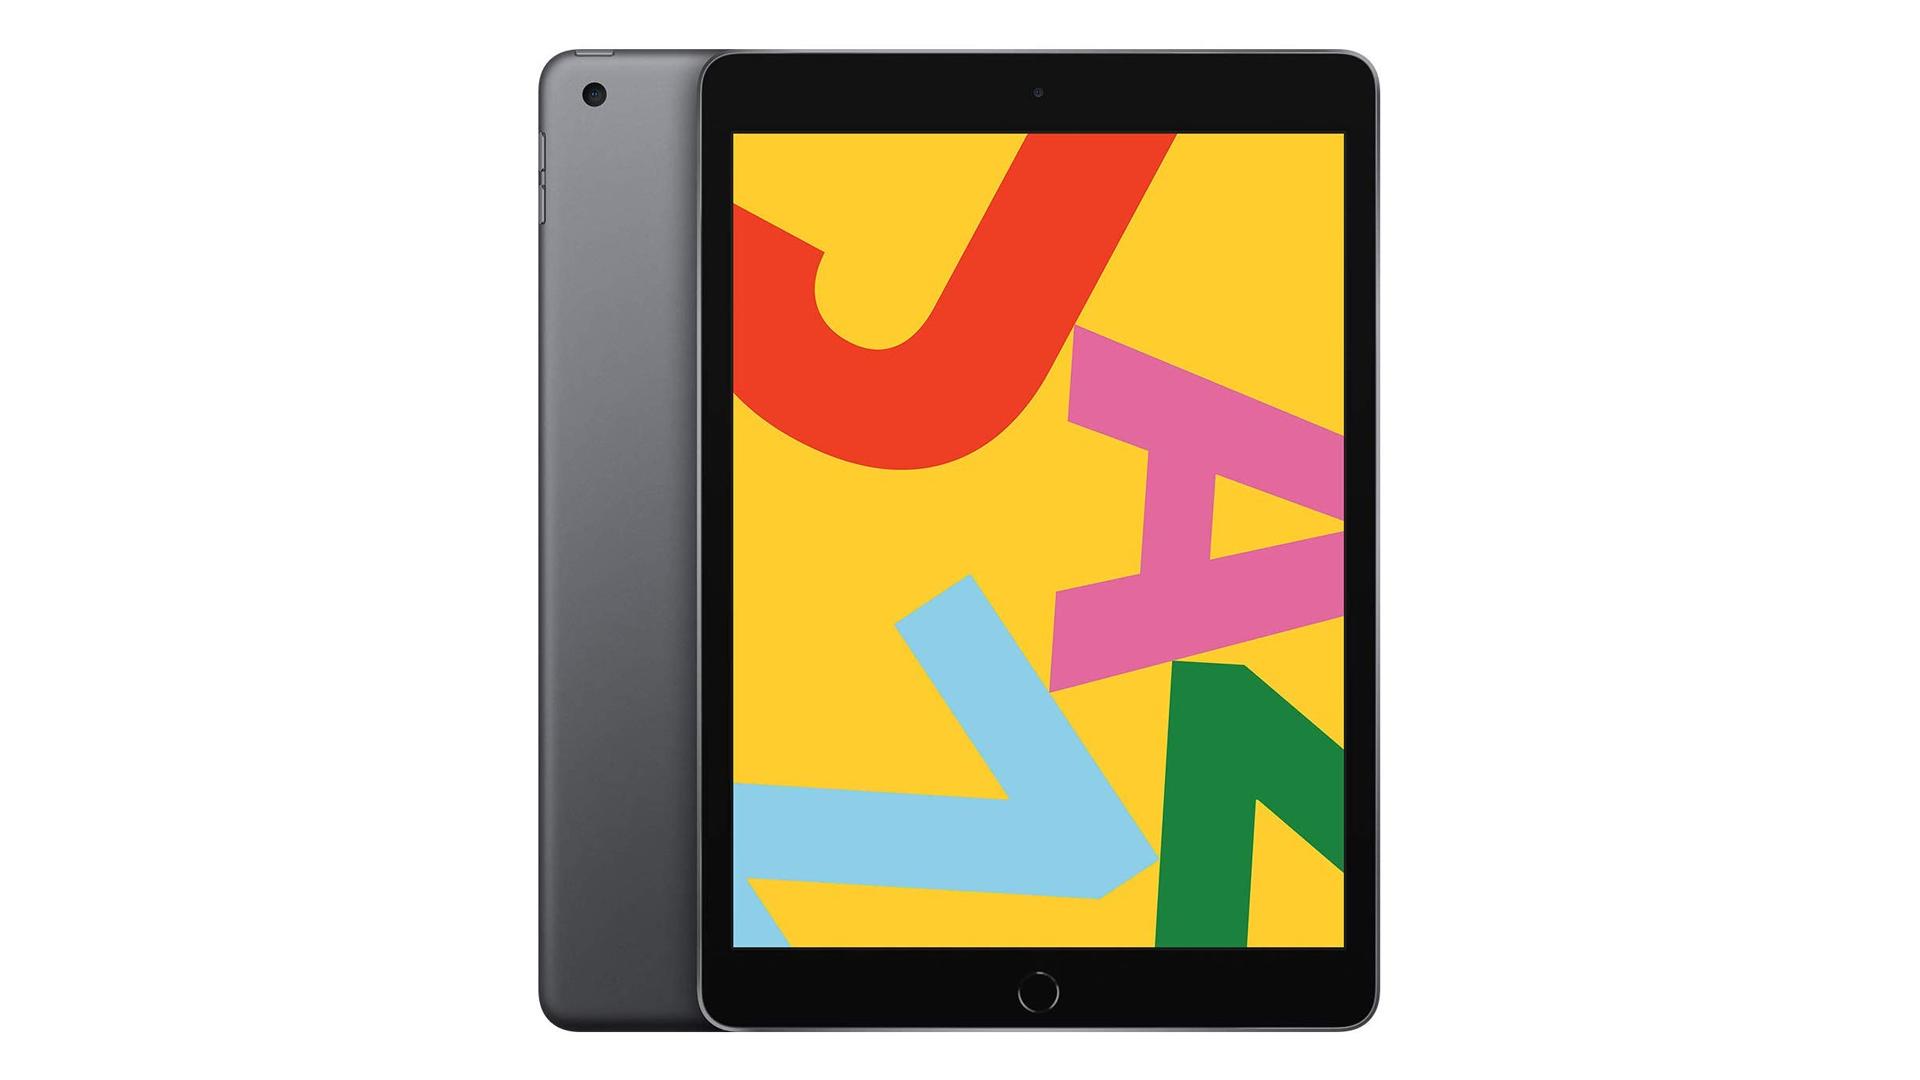 The standard iPad.